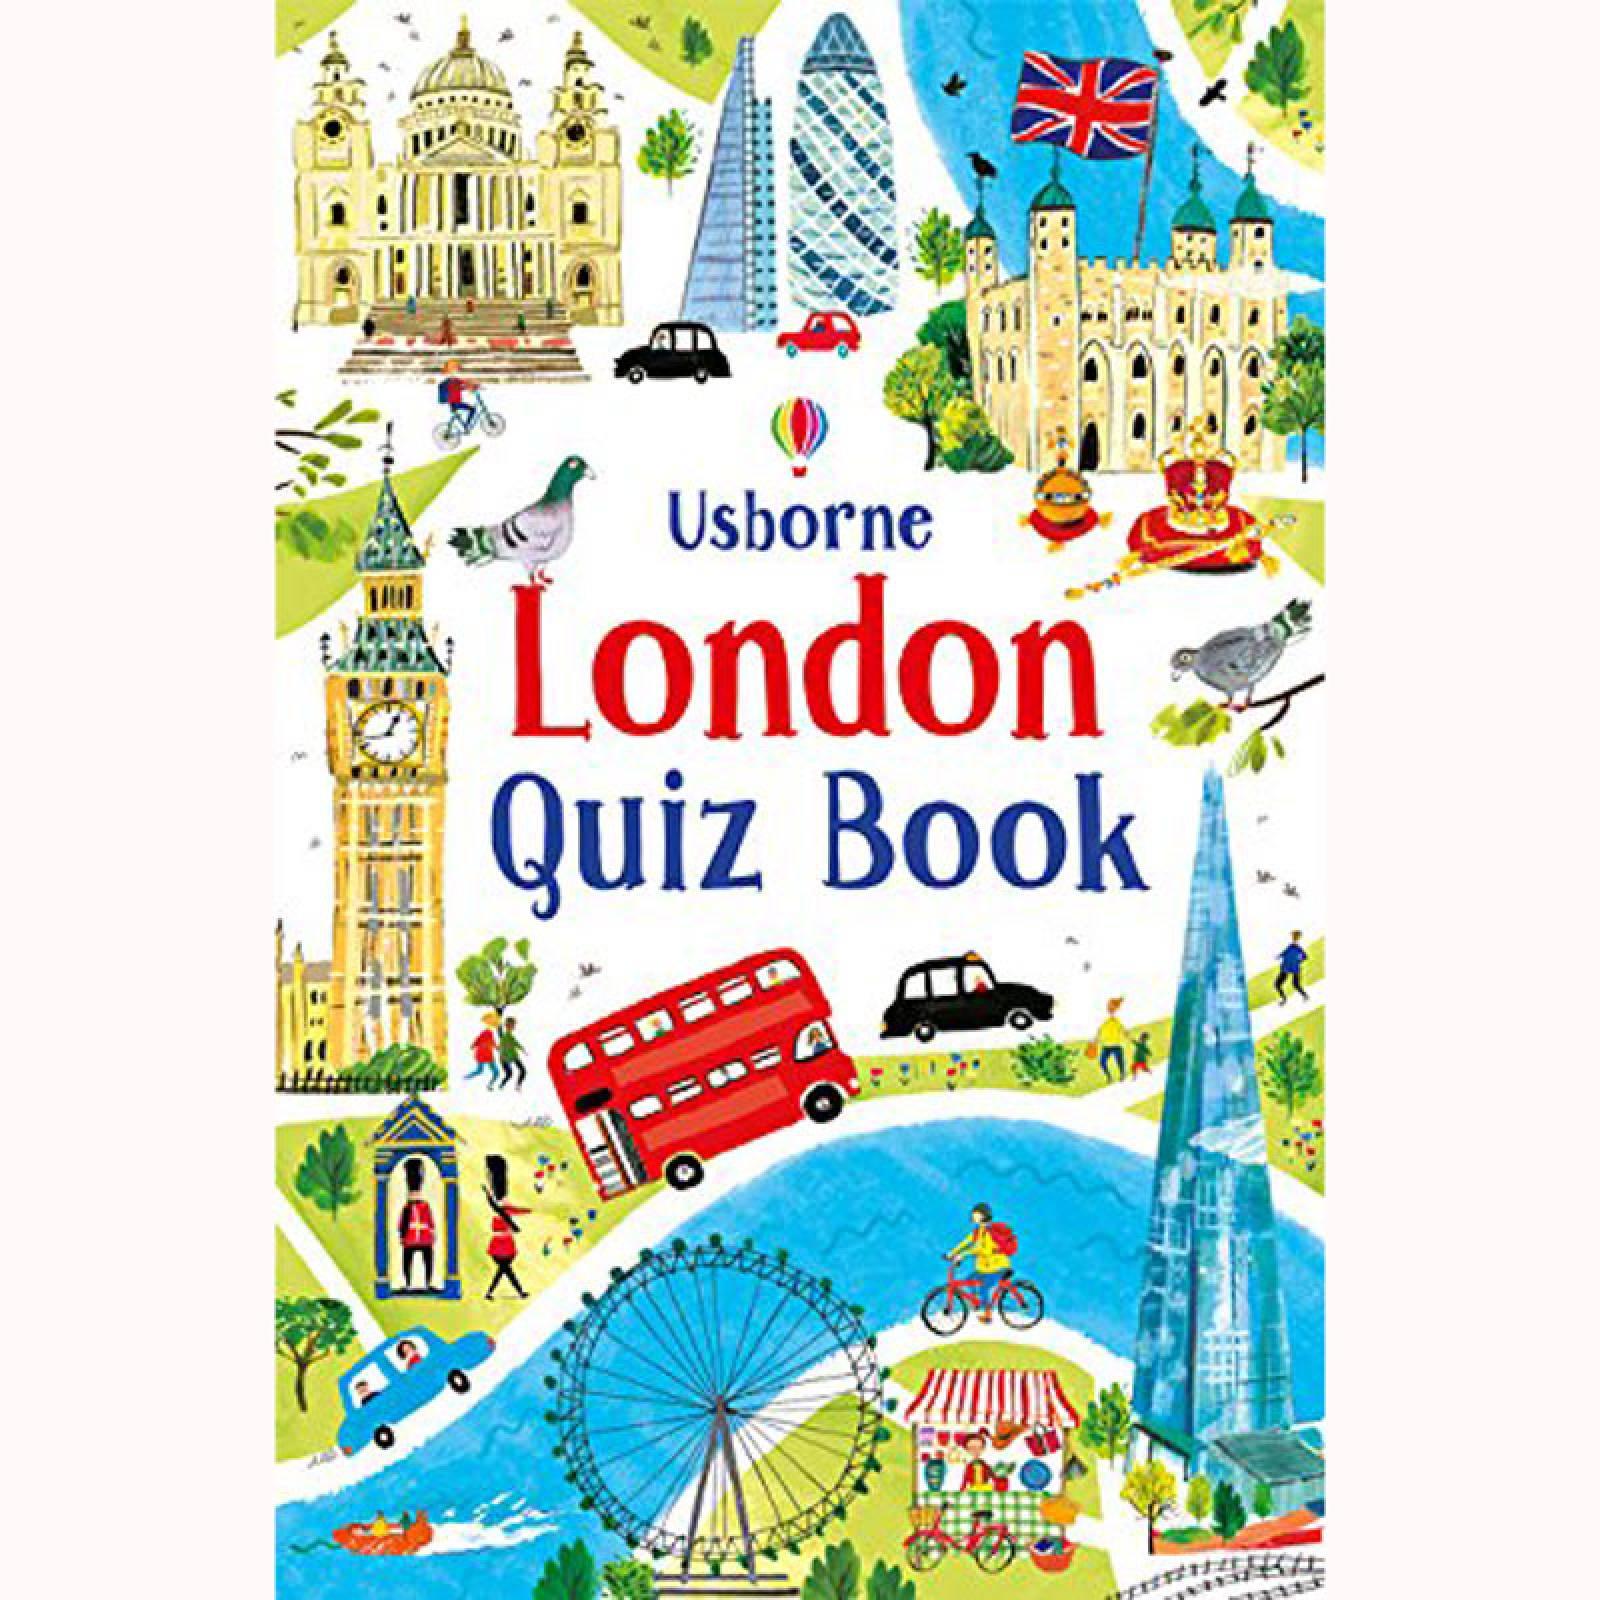 London Quiz Book - Paperback Book